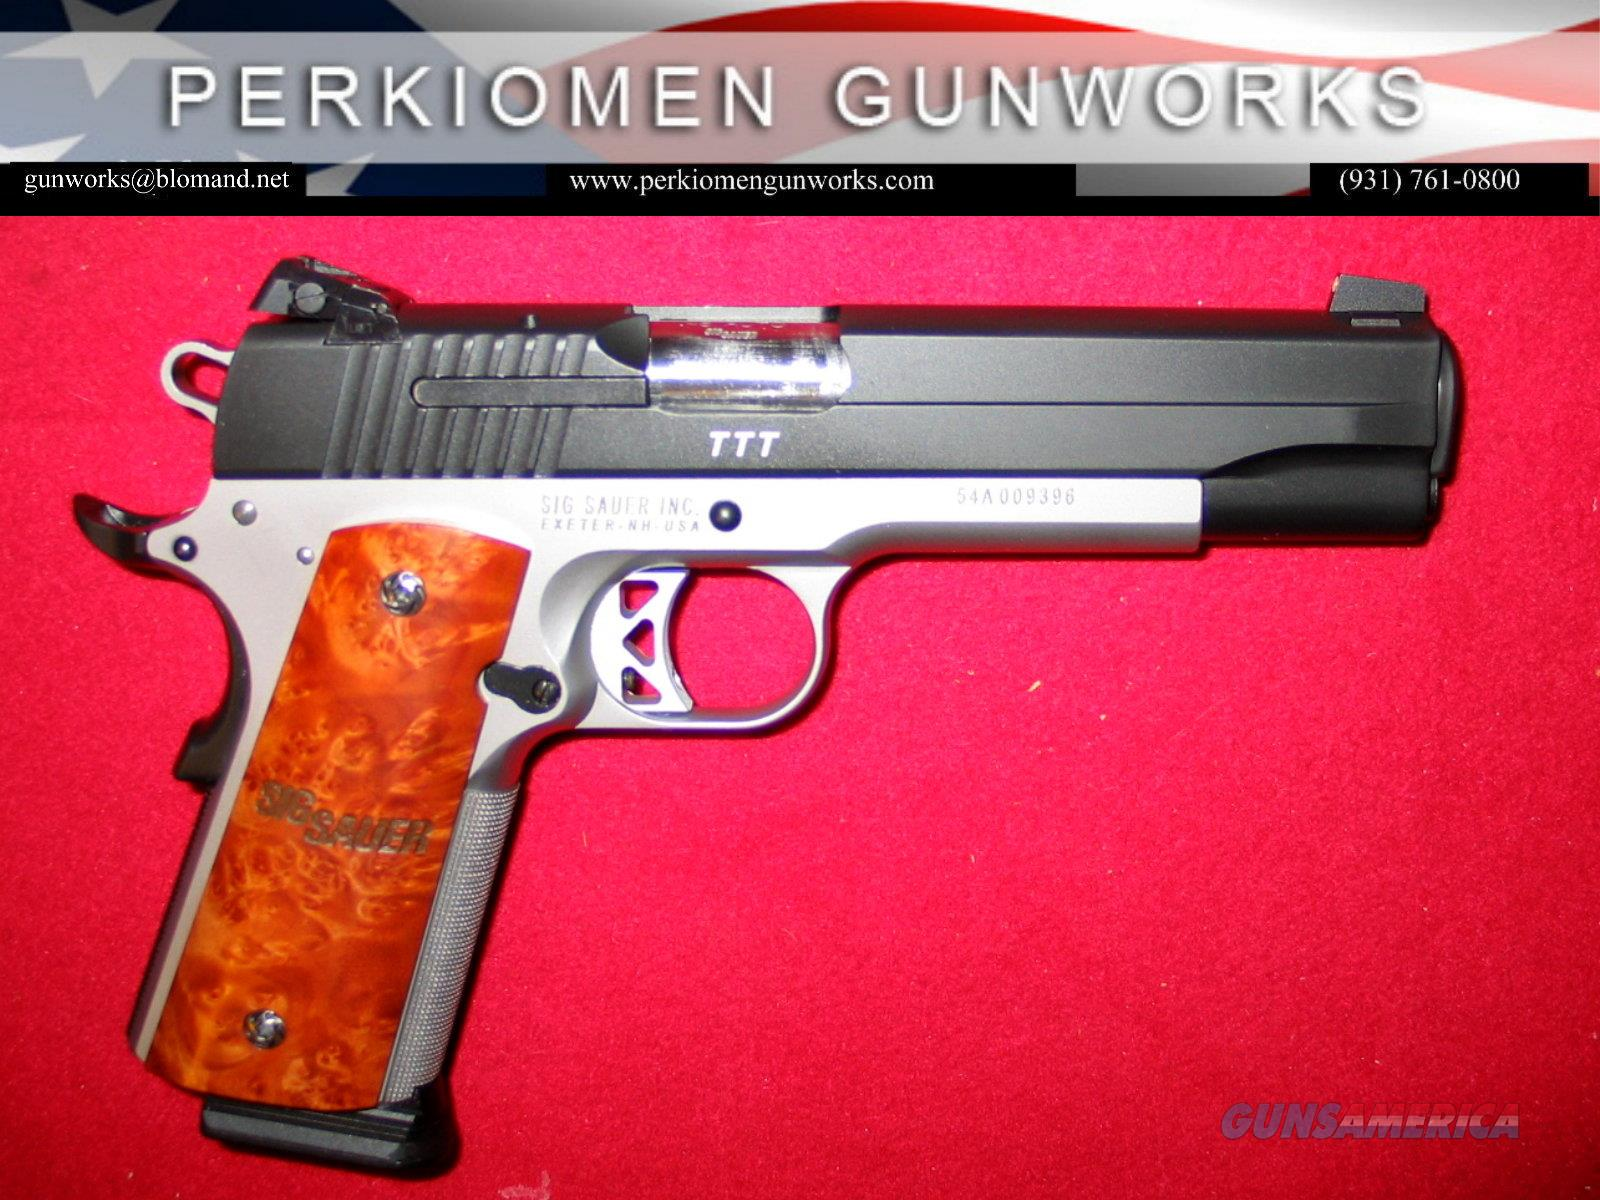 1911 TTT .45acp, 5 inch w/night sights  Guns > Pistols > Sig - Sauer/Sigarms Pistols > 1911